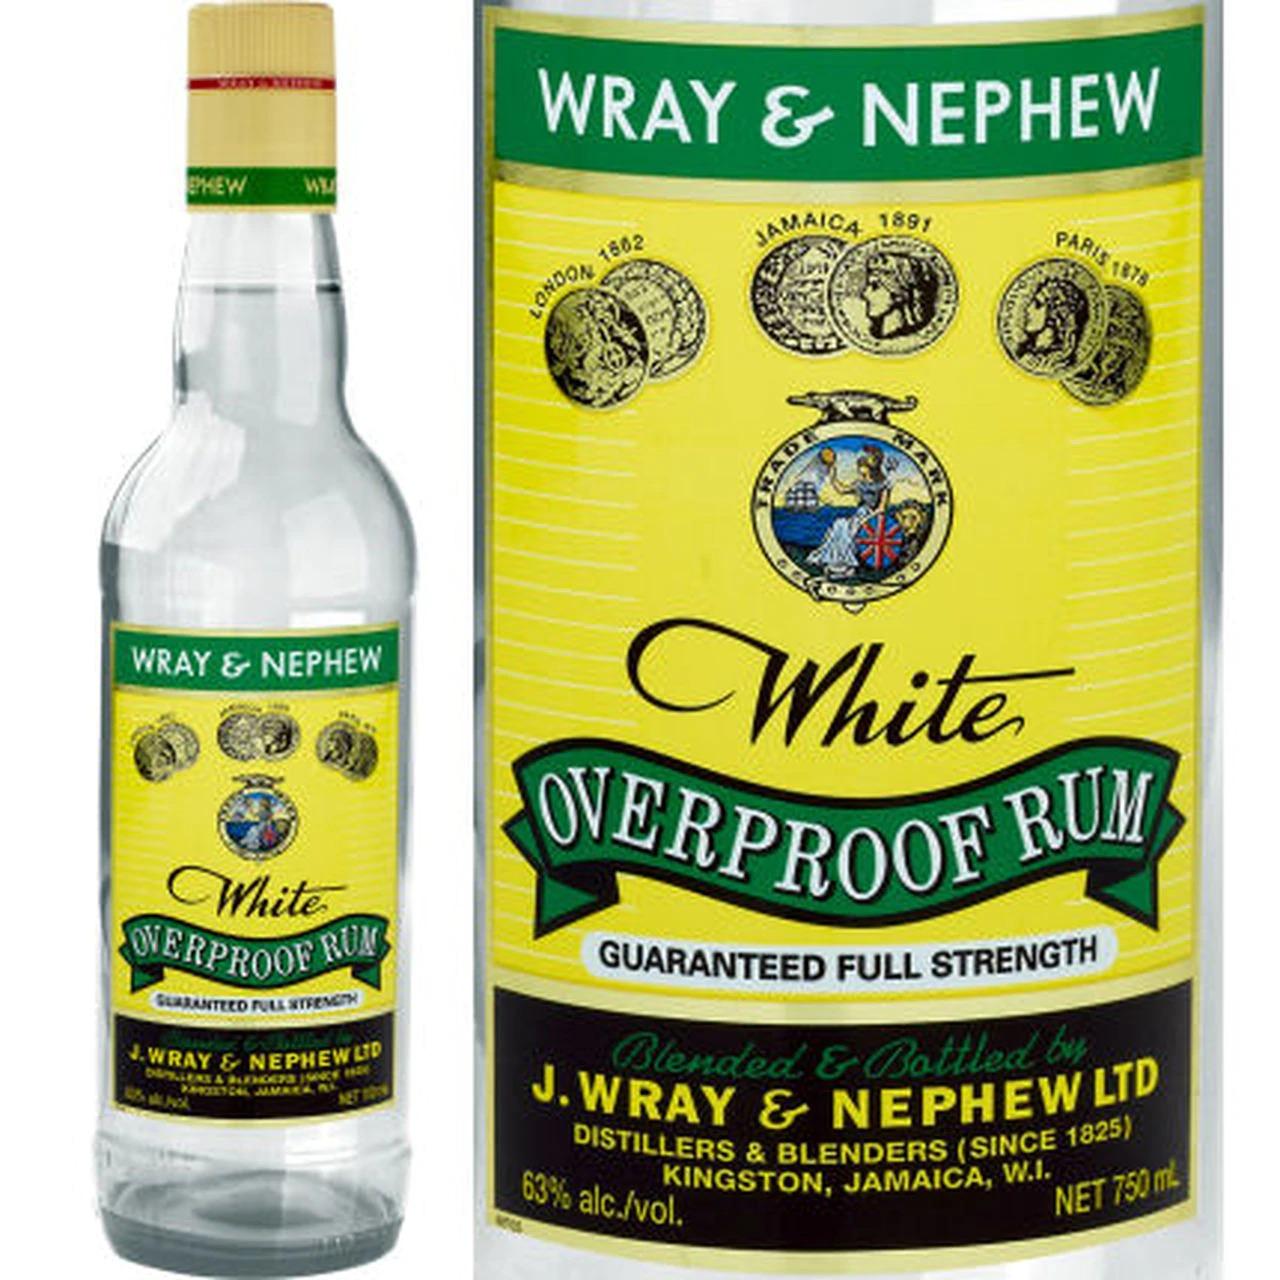 Wray & Nephew Get Wray & Nephew Link Thumbnail   Linktree